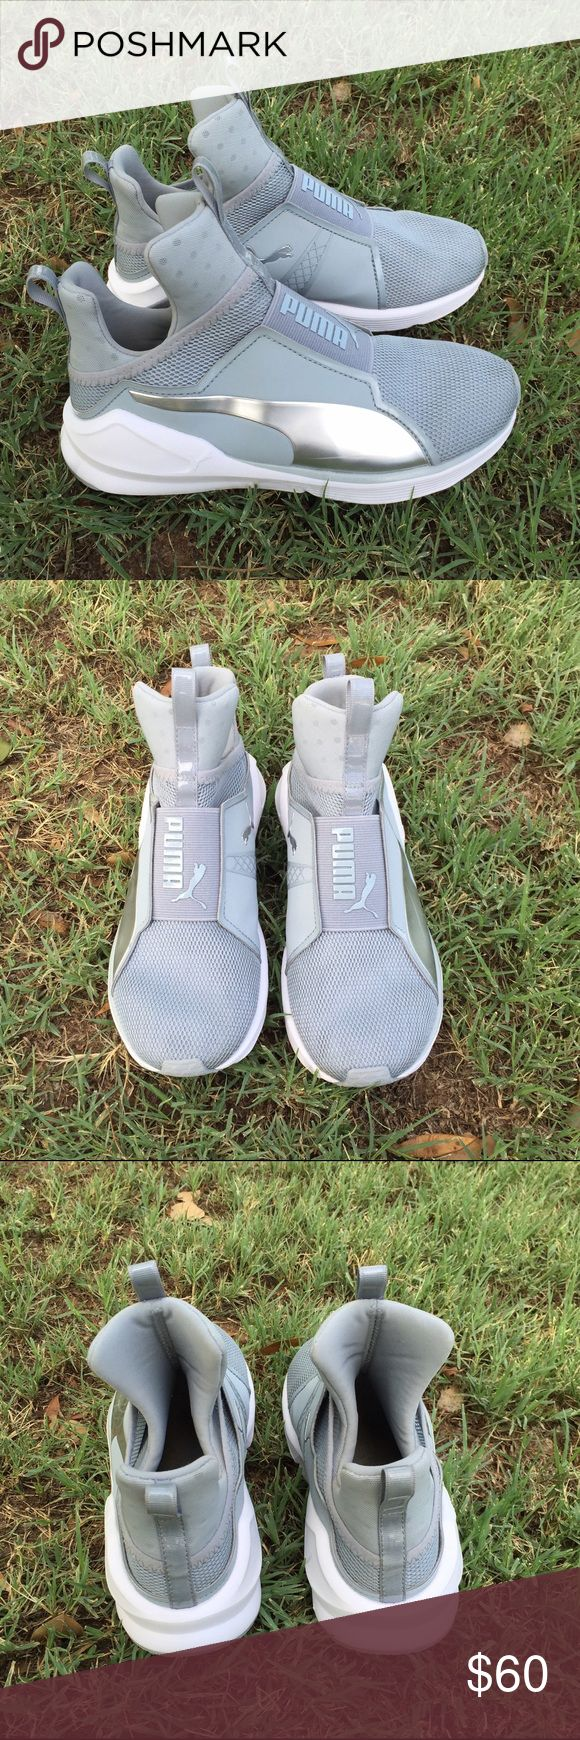 "Kyle Jenner x Puma ""Fierce"" Kylie Jenner x Puma ""fierce"" Silver/White Women's size 6 Like new worn once No box Puma Shoes Athletic Shoes"